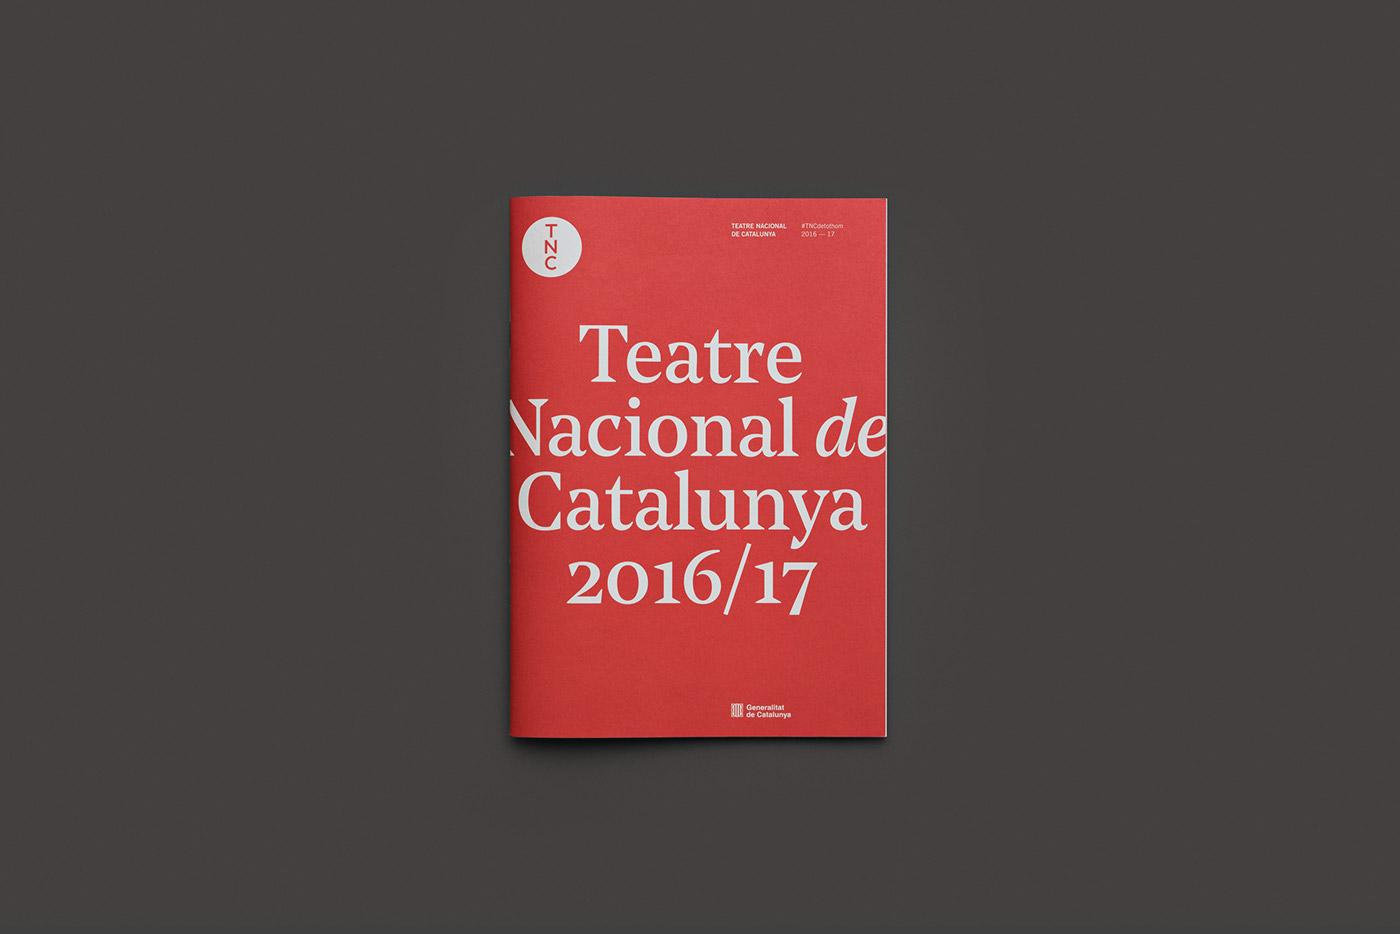 Teatre nacional de catalunya 16 17 on behance for Teatre nacional de catalunya